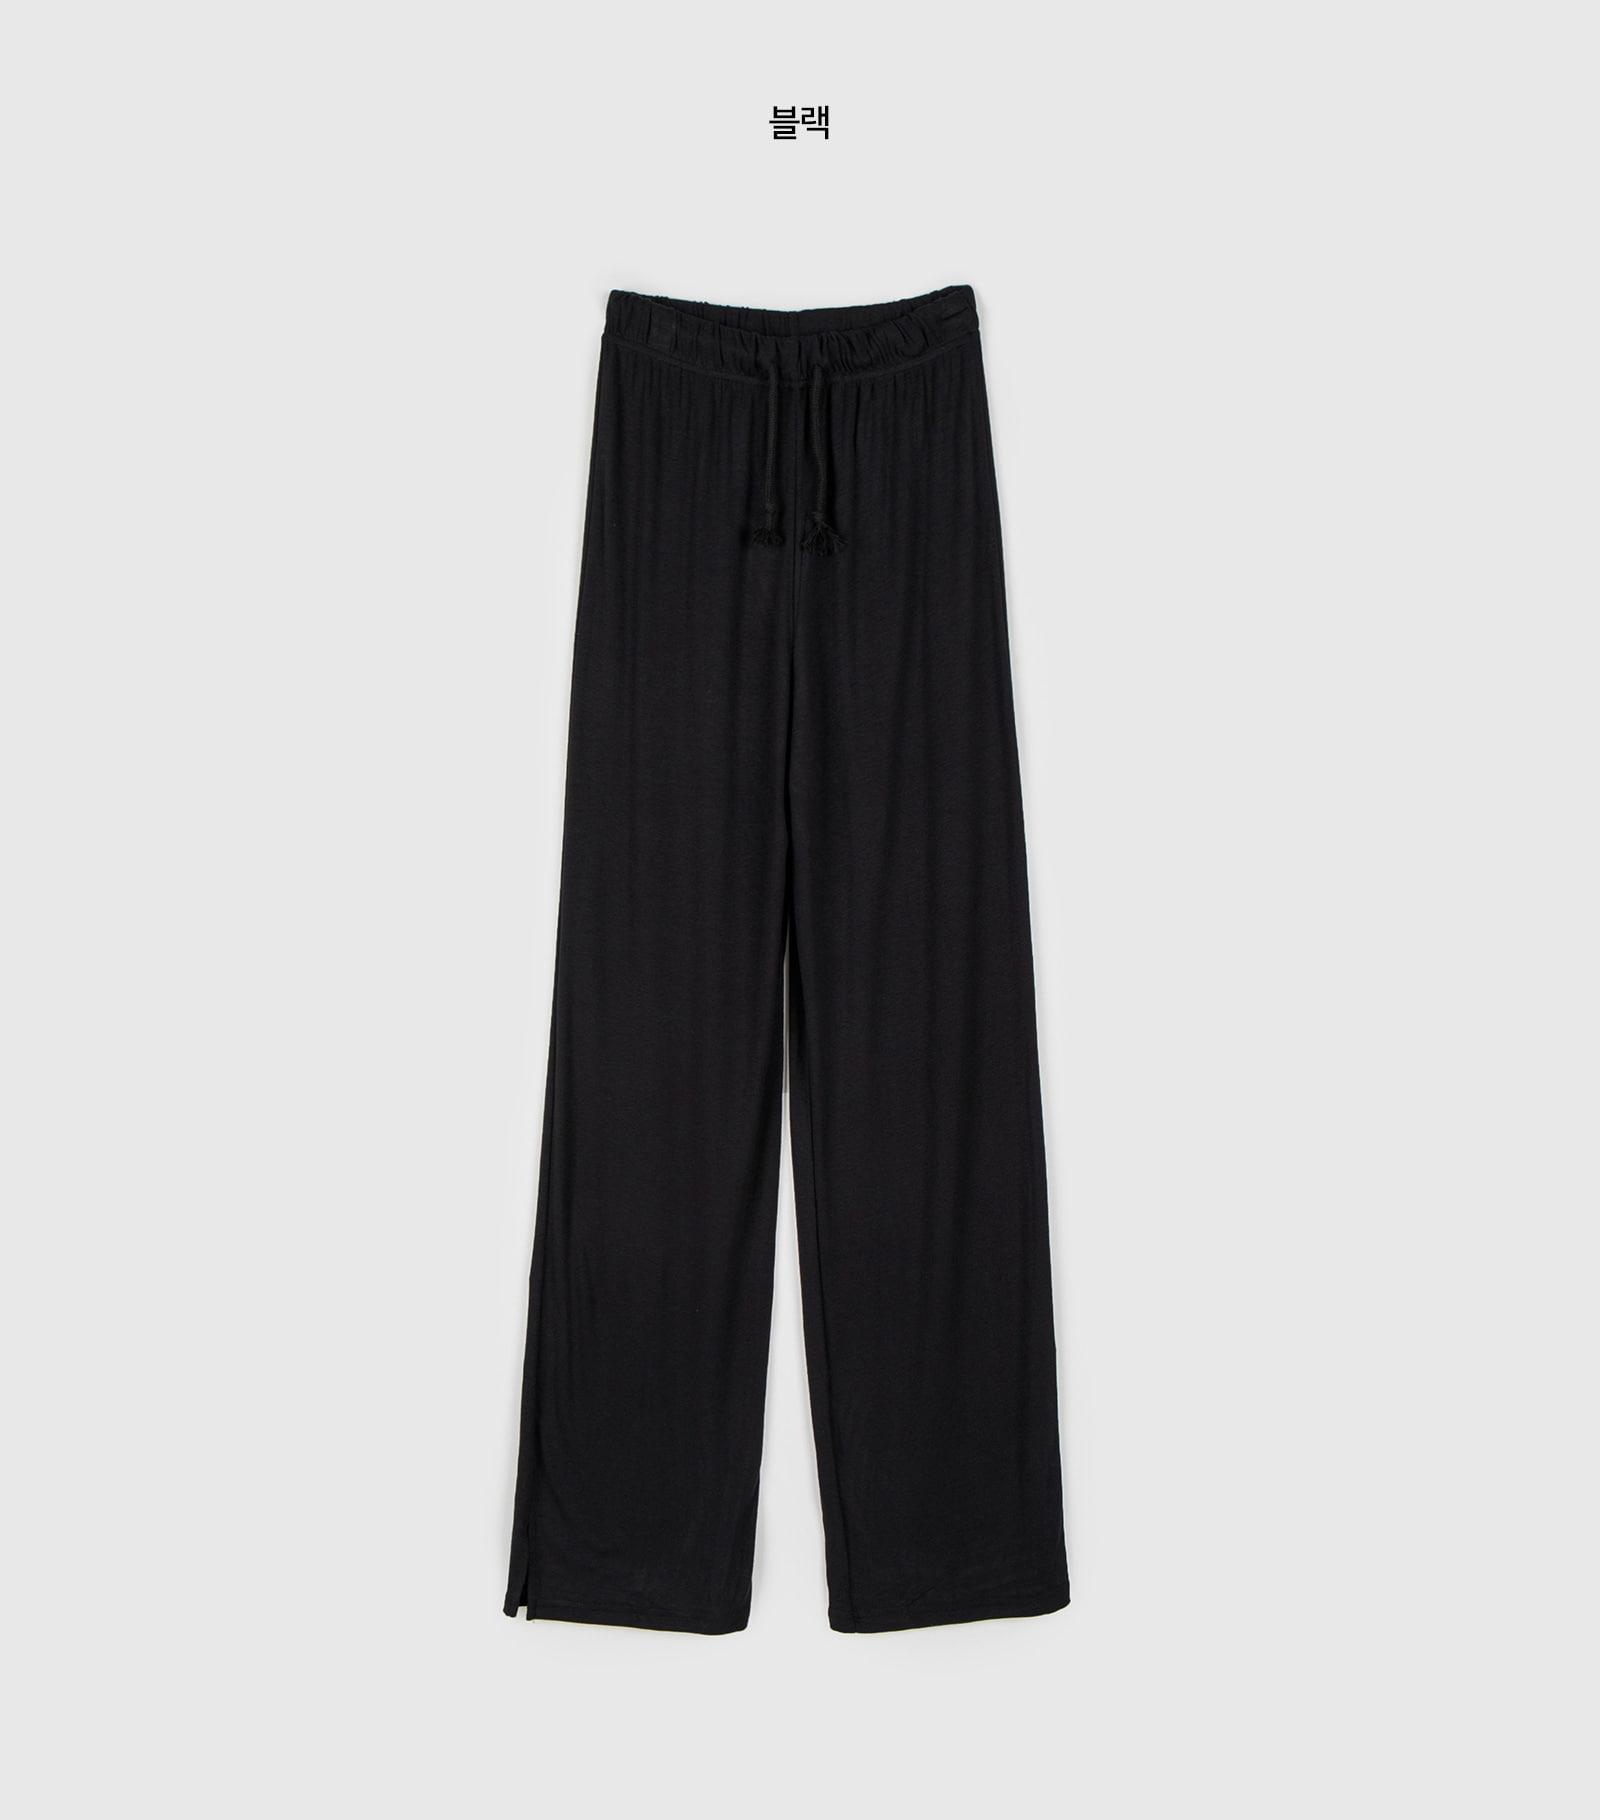 Summer slit banding training pants